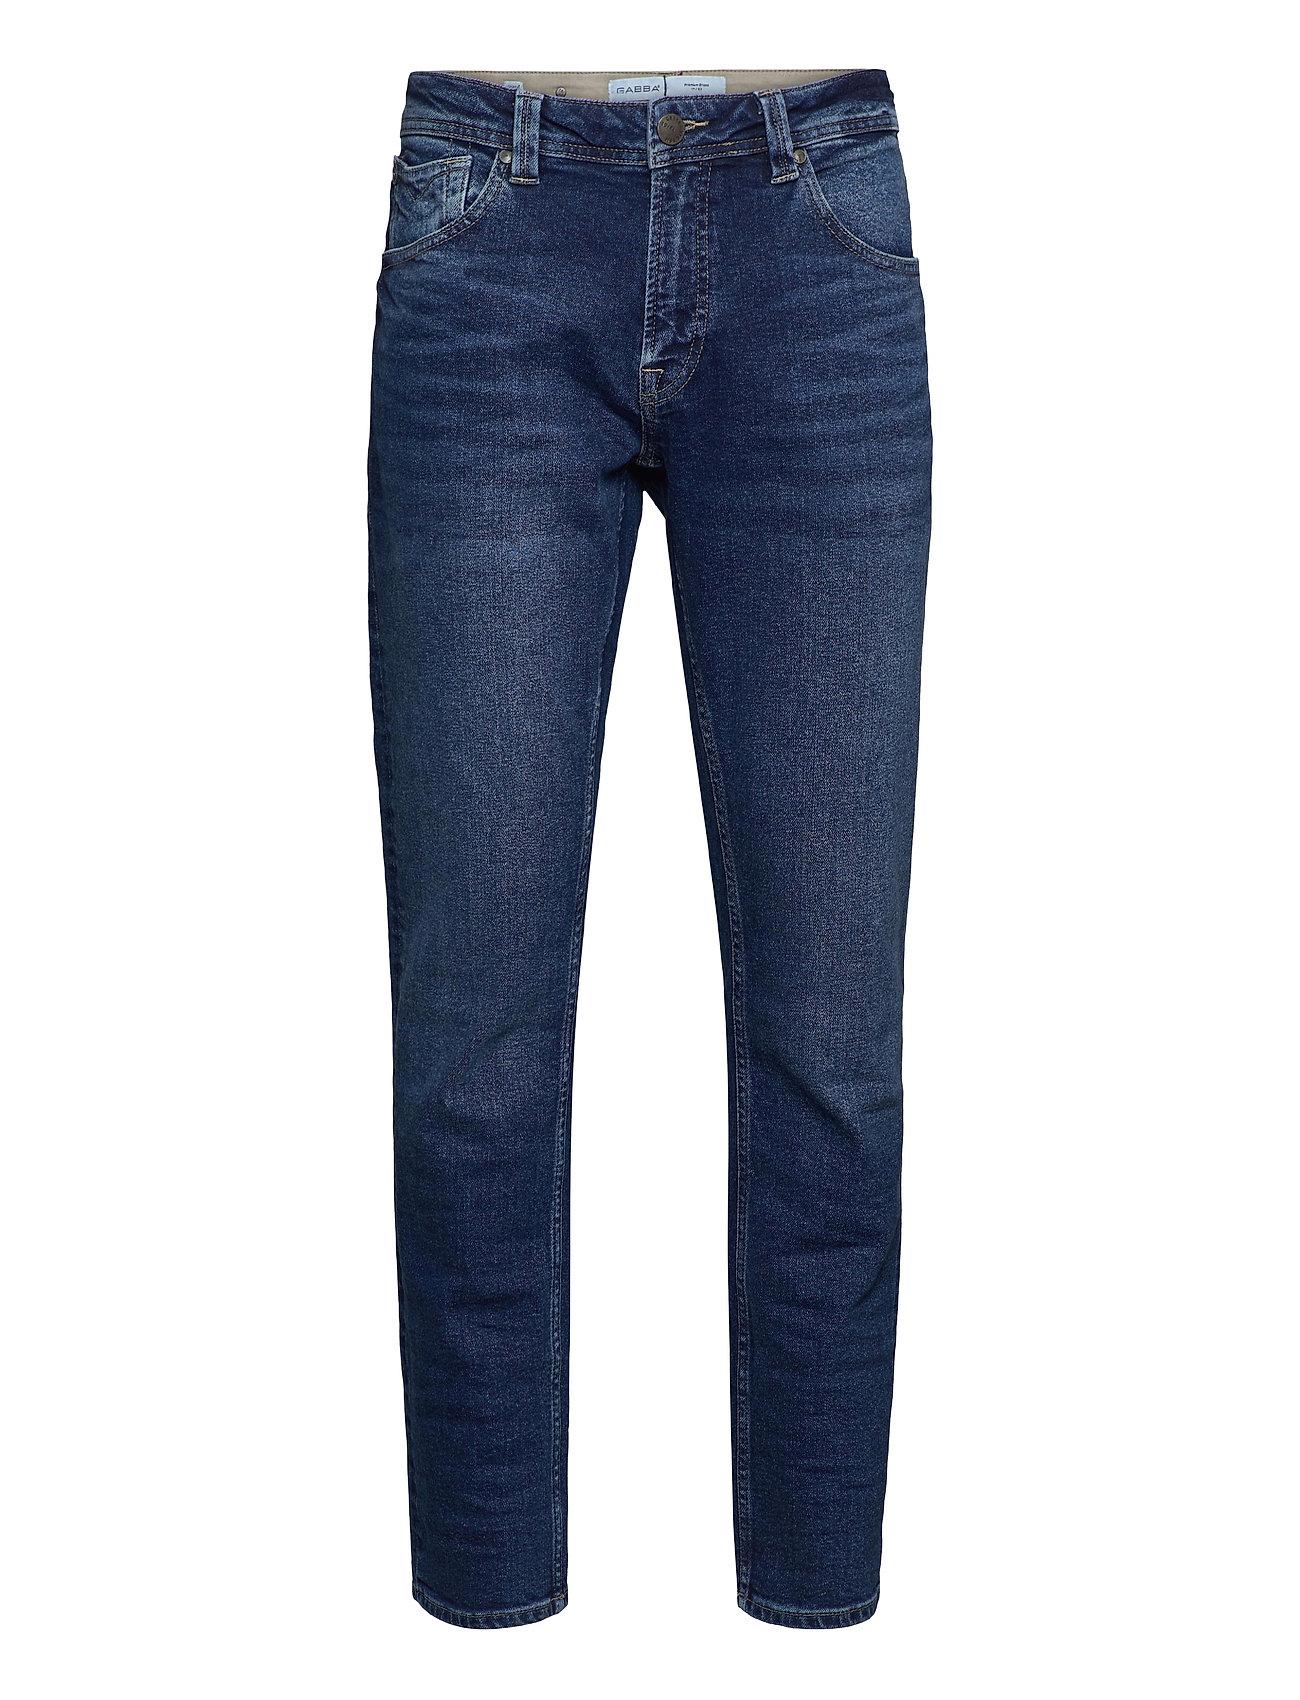 Image of Nico K3572 Jeans Jeans Blå Gabba (3493873967)